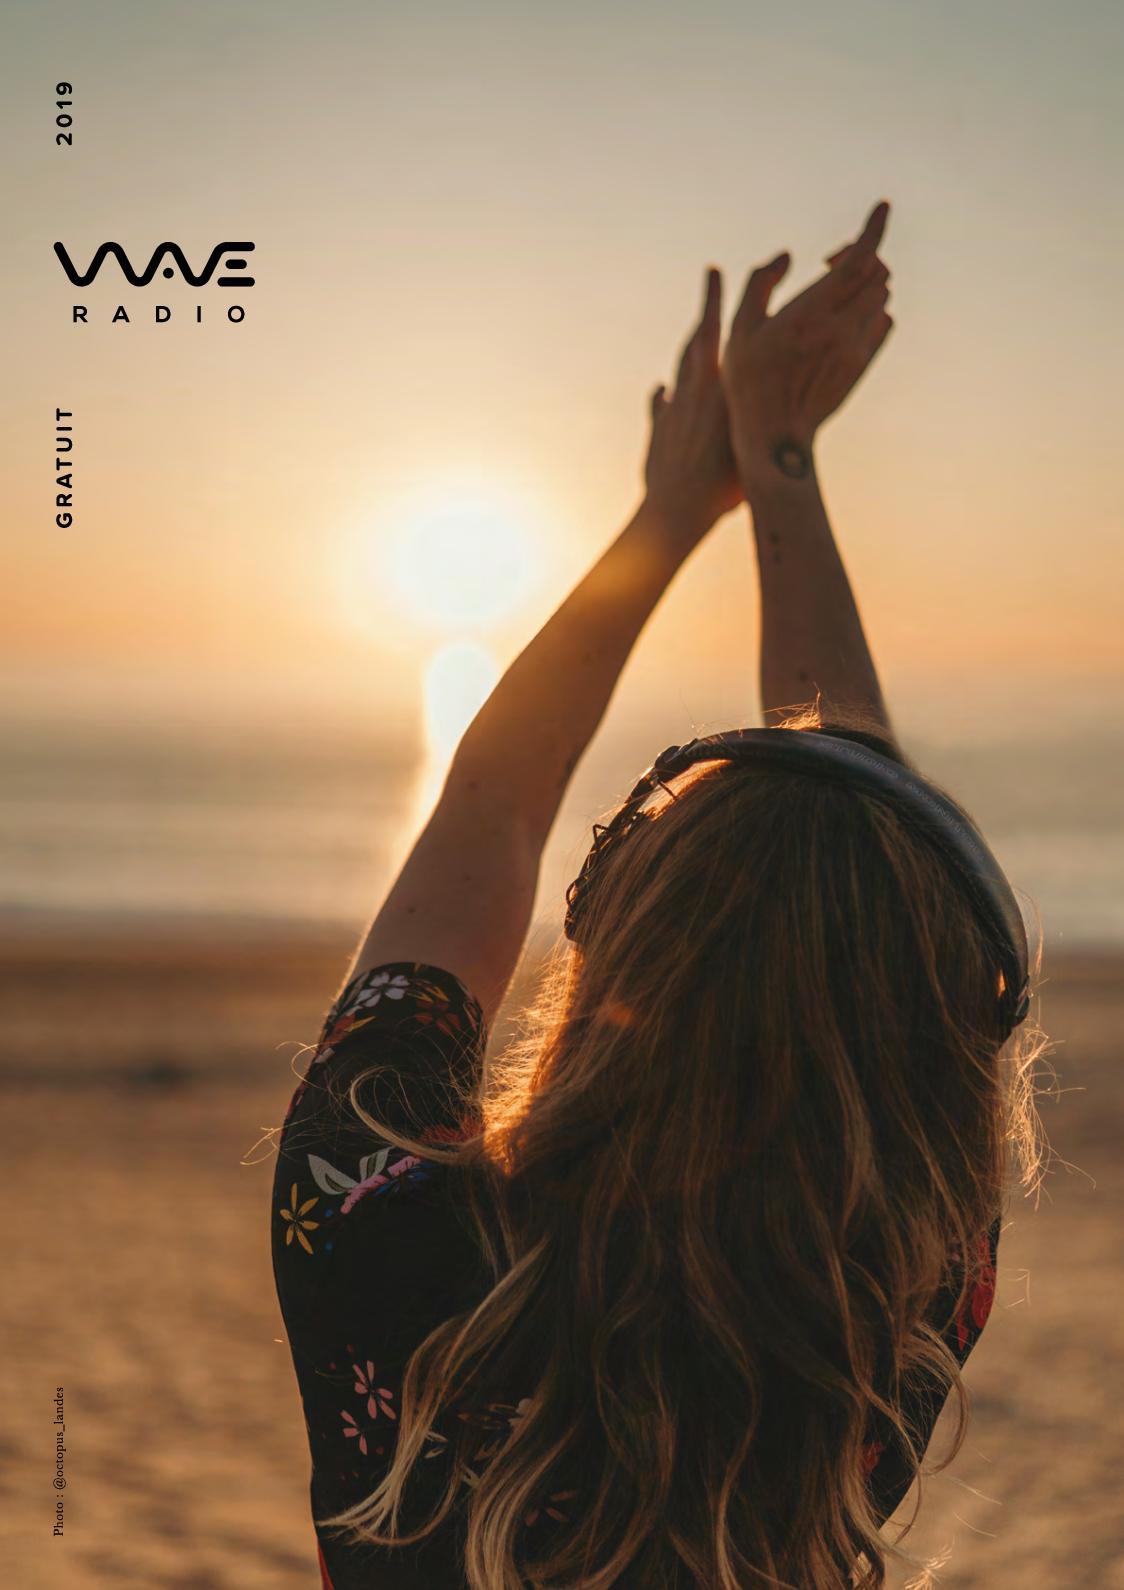 Wave 2019 Radio Radio 2019 Calaméo Calaméo Wave Magazine Calaméo Wave Radio Magazine m8v0OnNw